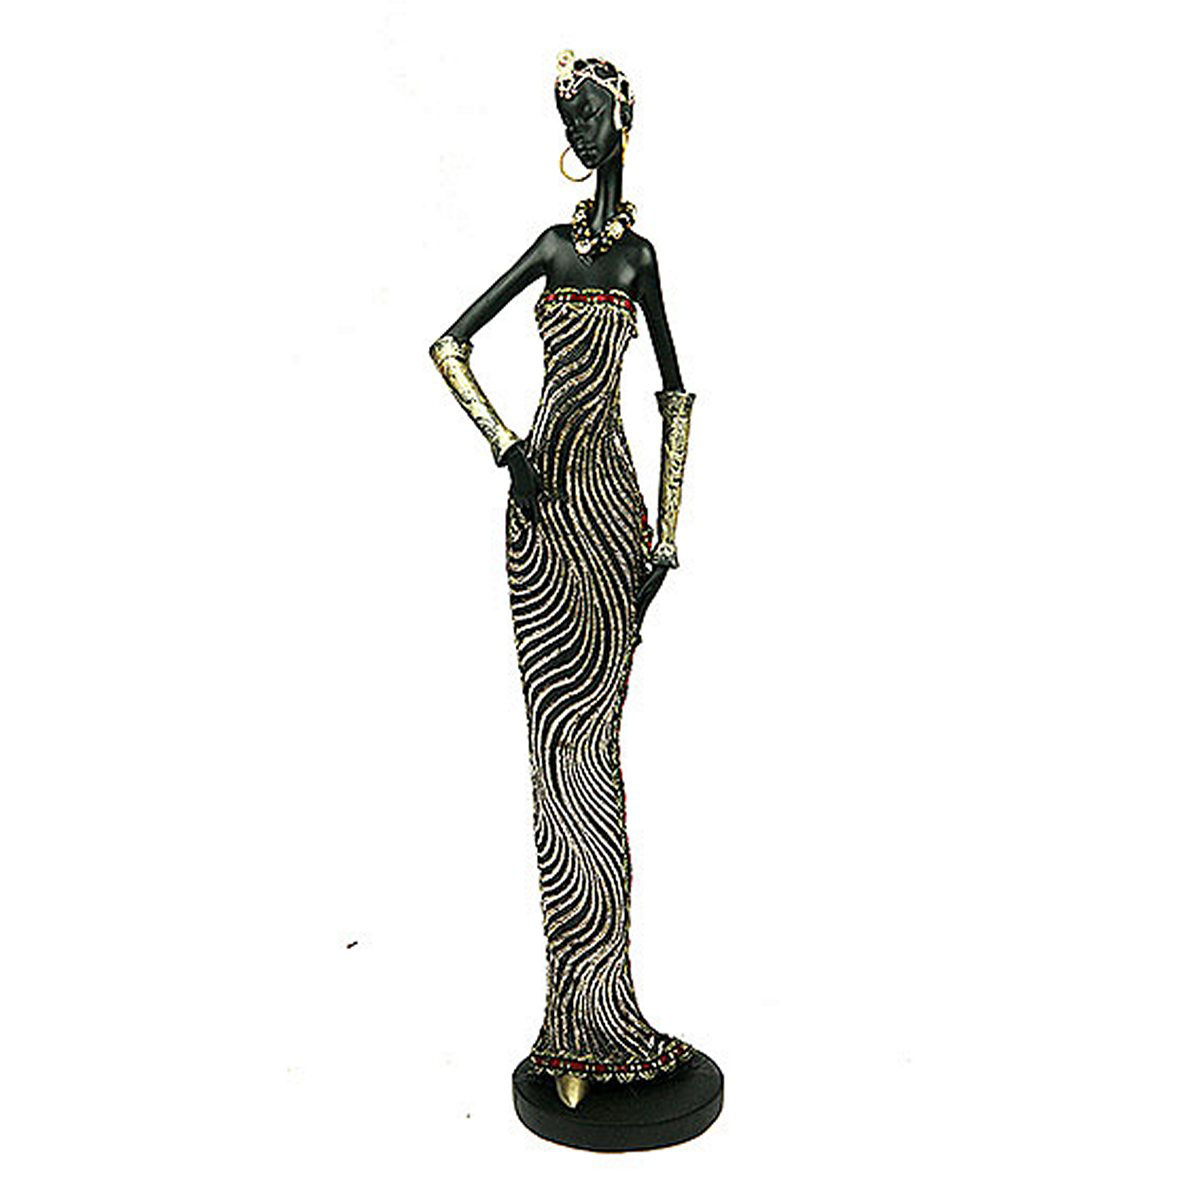 Статуэтка Русские Подарки Африканка, 7 х 8 х 32 см статуэтка lefard африканка 174 311